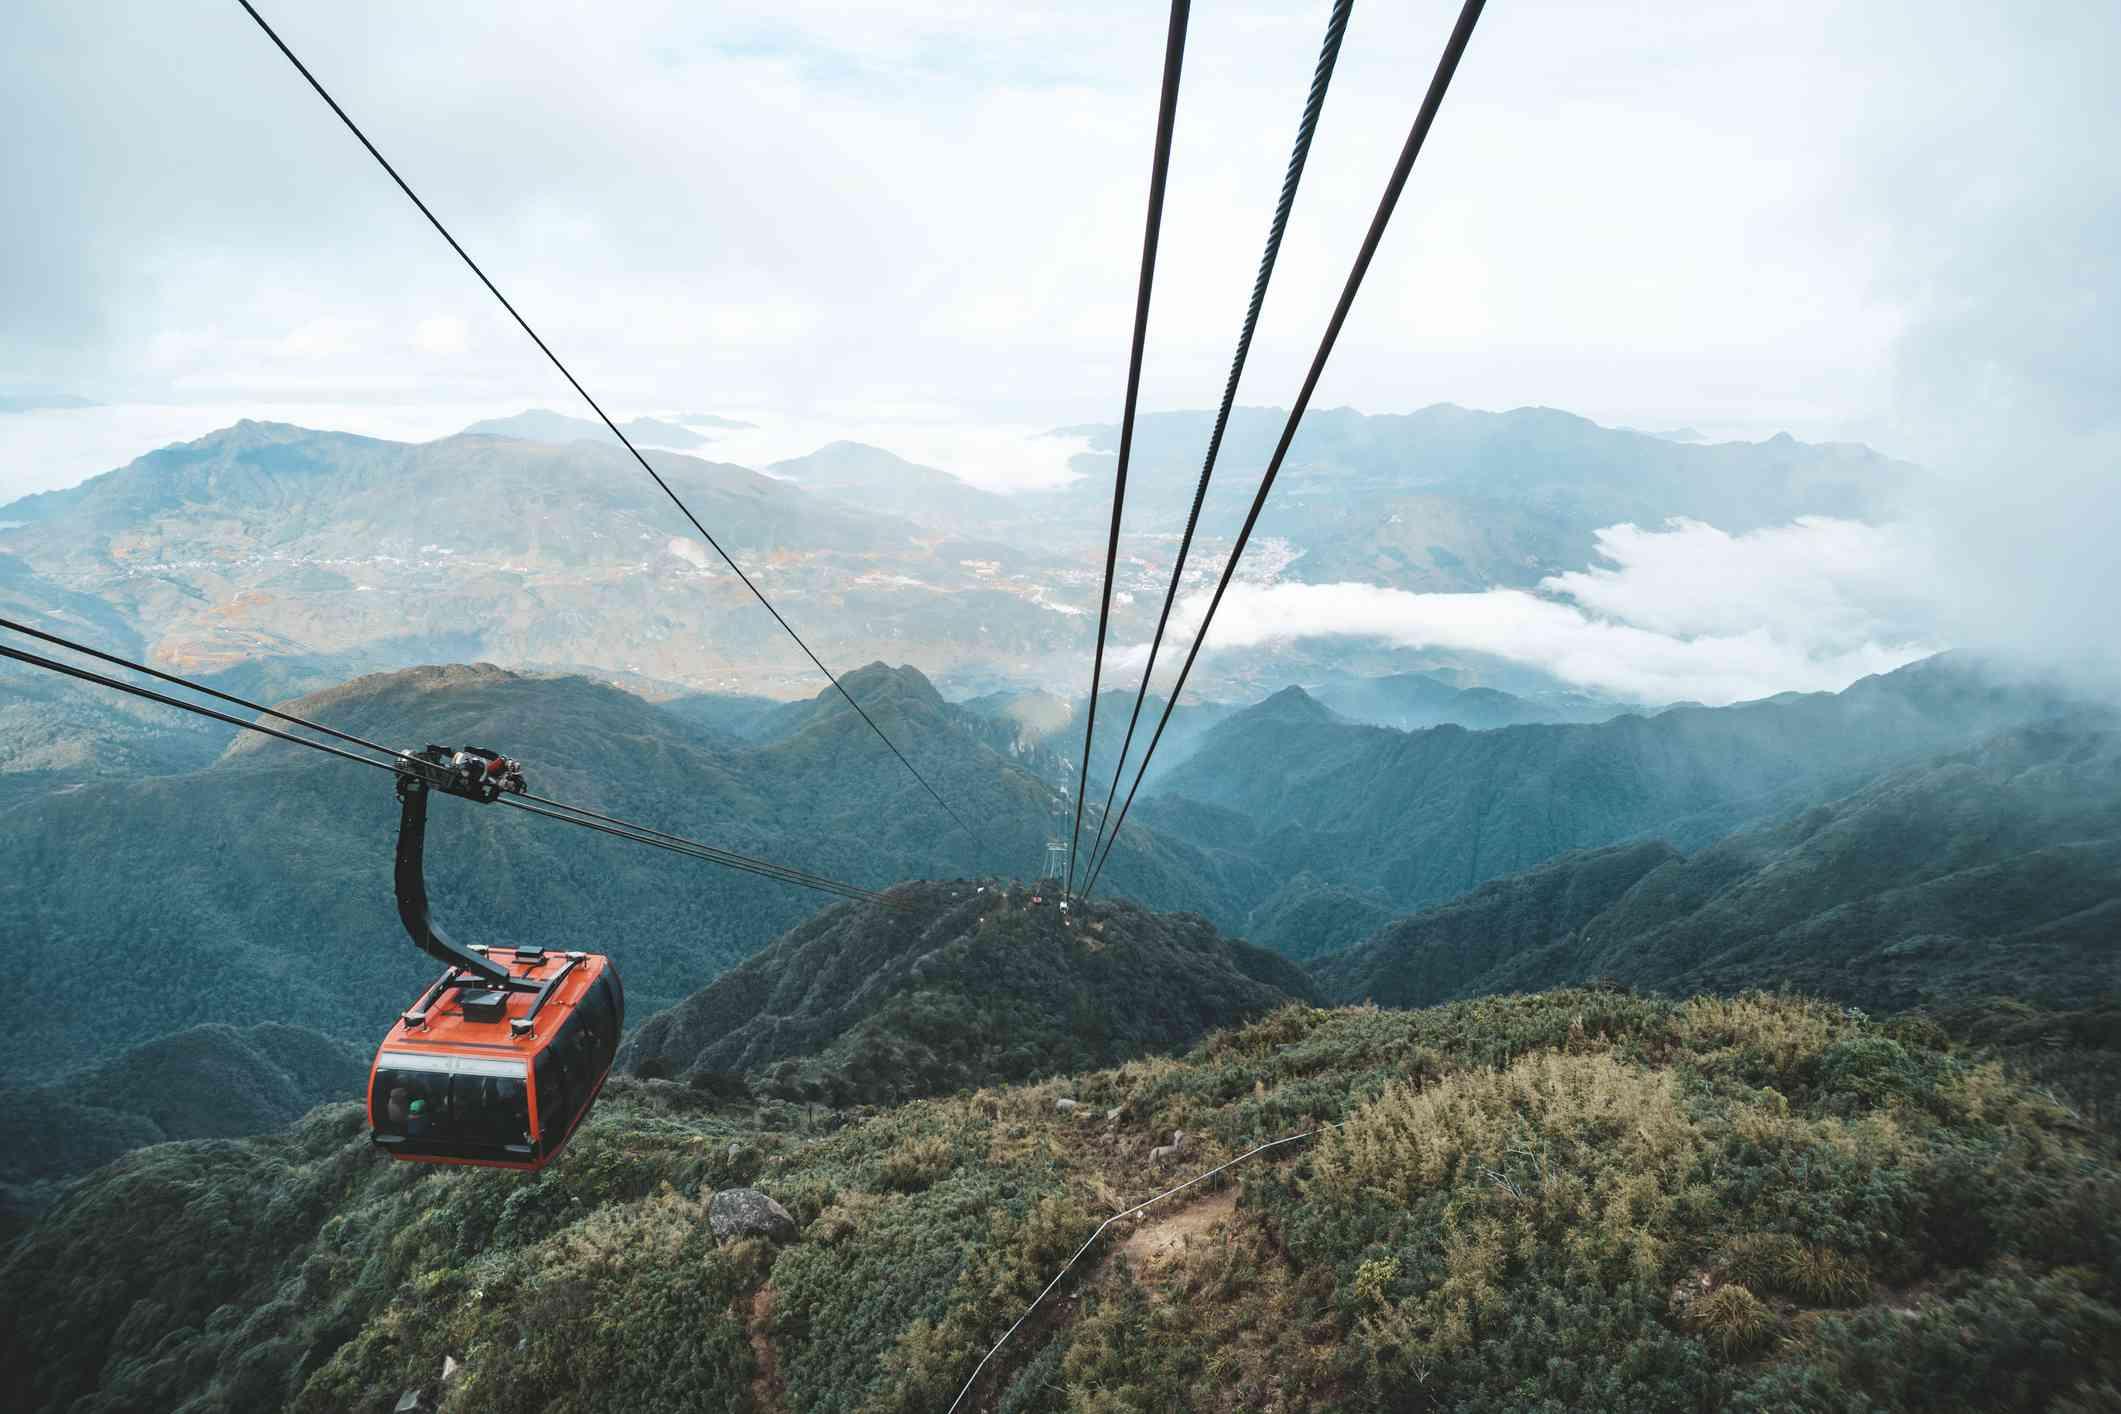 Cable car ascending Fansipan in Sapa, Vietnam